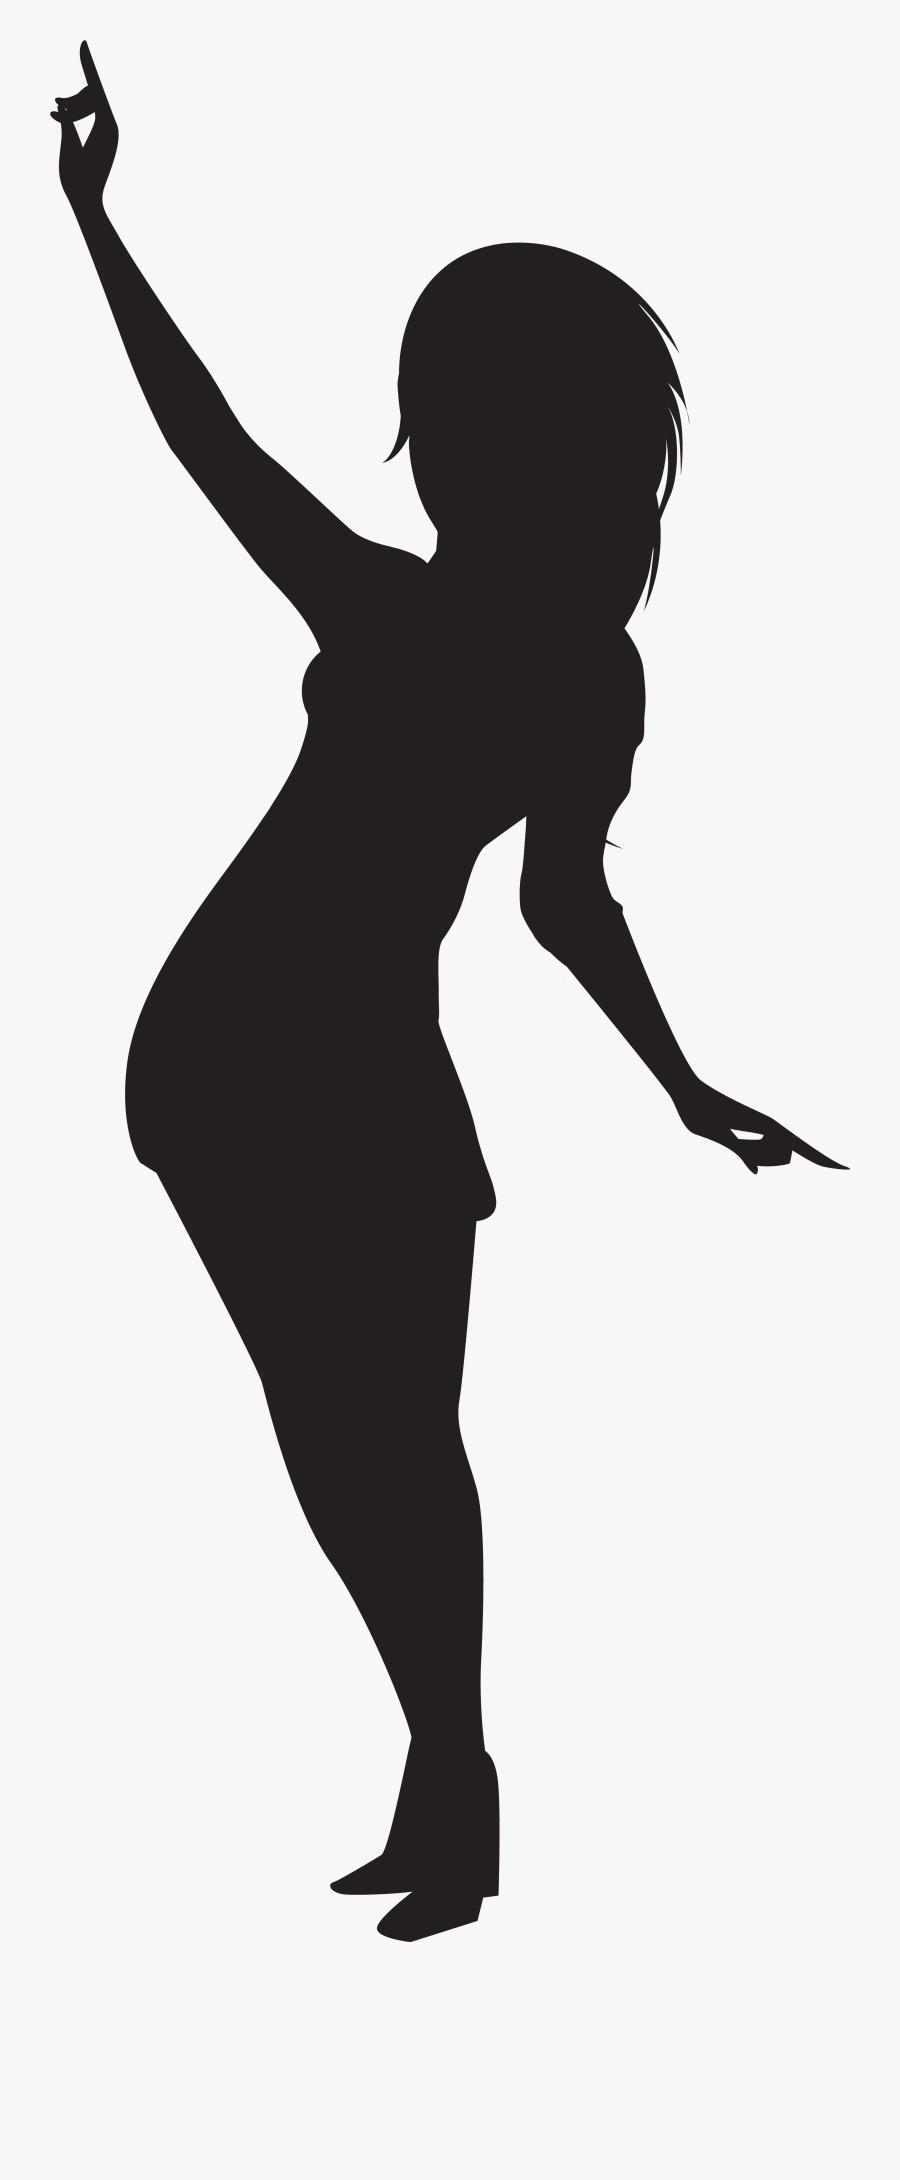 Dancing Girl Silhouette Png Clip Artu200b Gallery Yopriceville - Dancing Girl Silhouette Png, Transparent Clipart